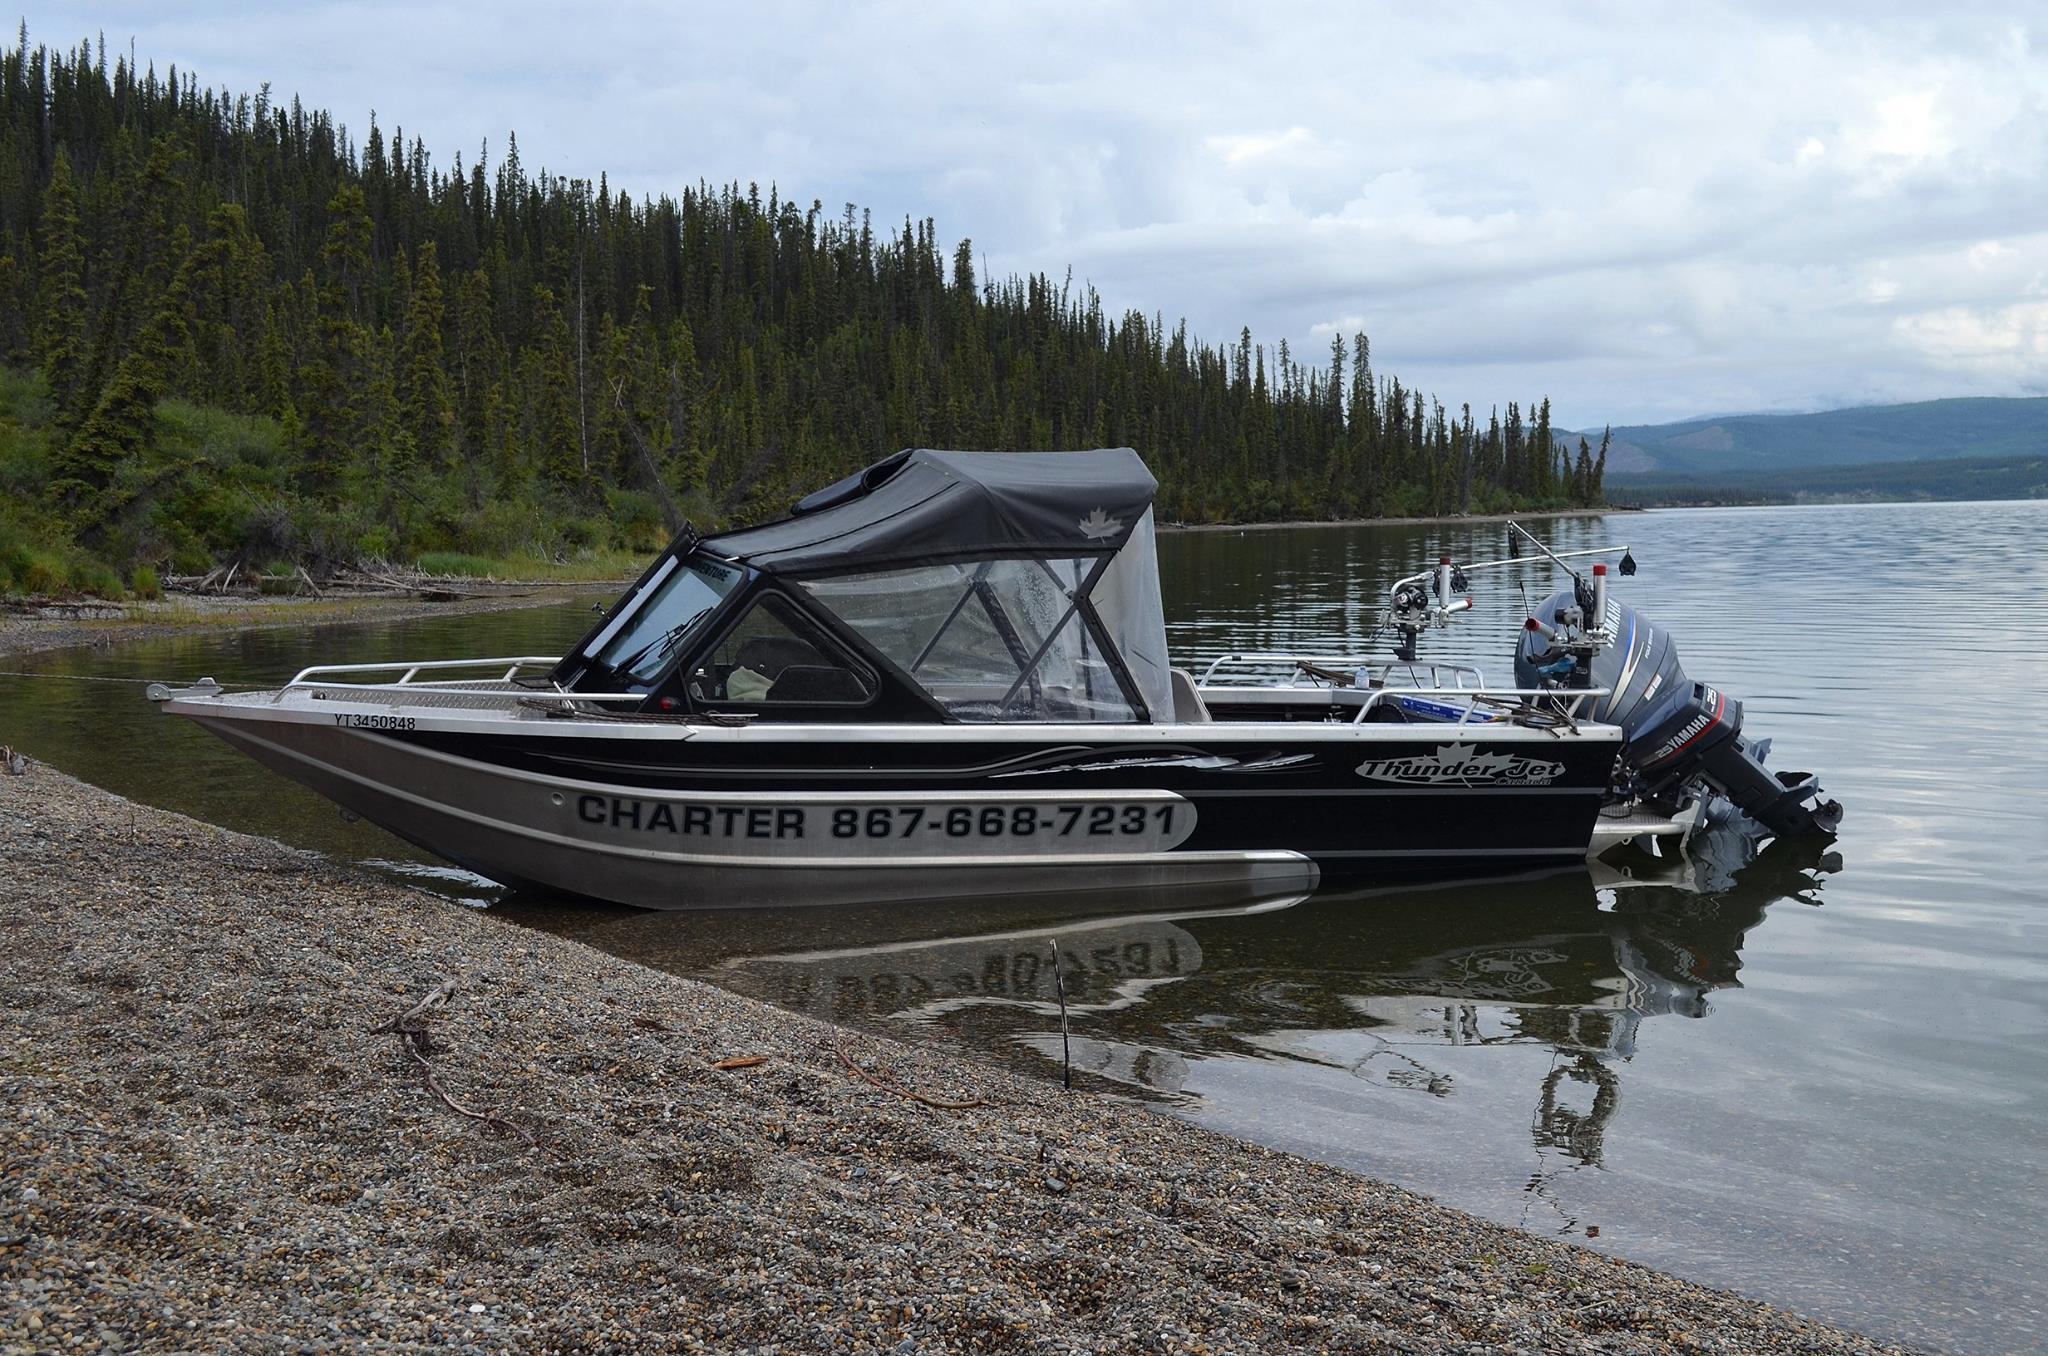 bâteau Yukon Fishing Adventure